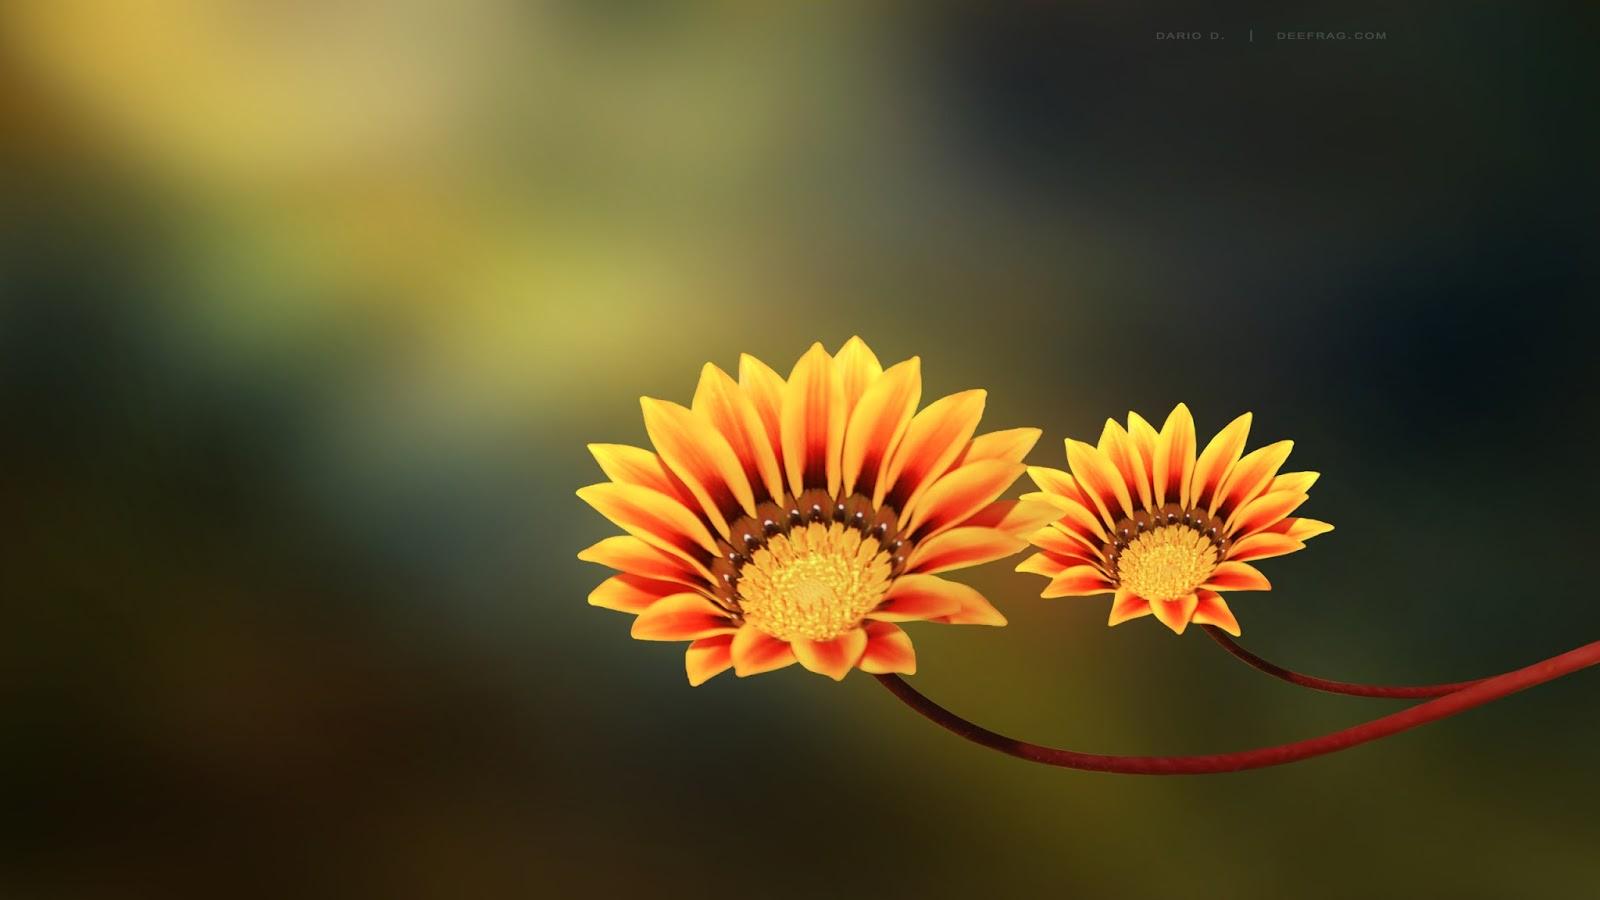 Flowers for flower lovers beautiful flowers desktop - Beautiful flower images wallpapers ...